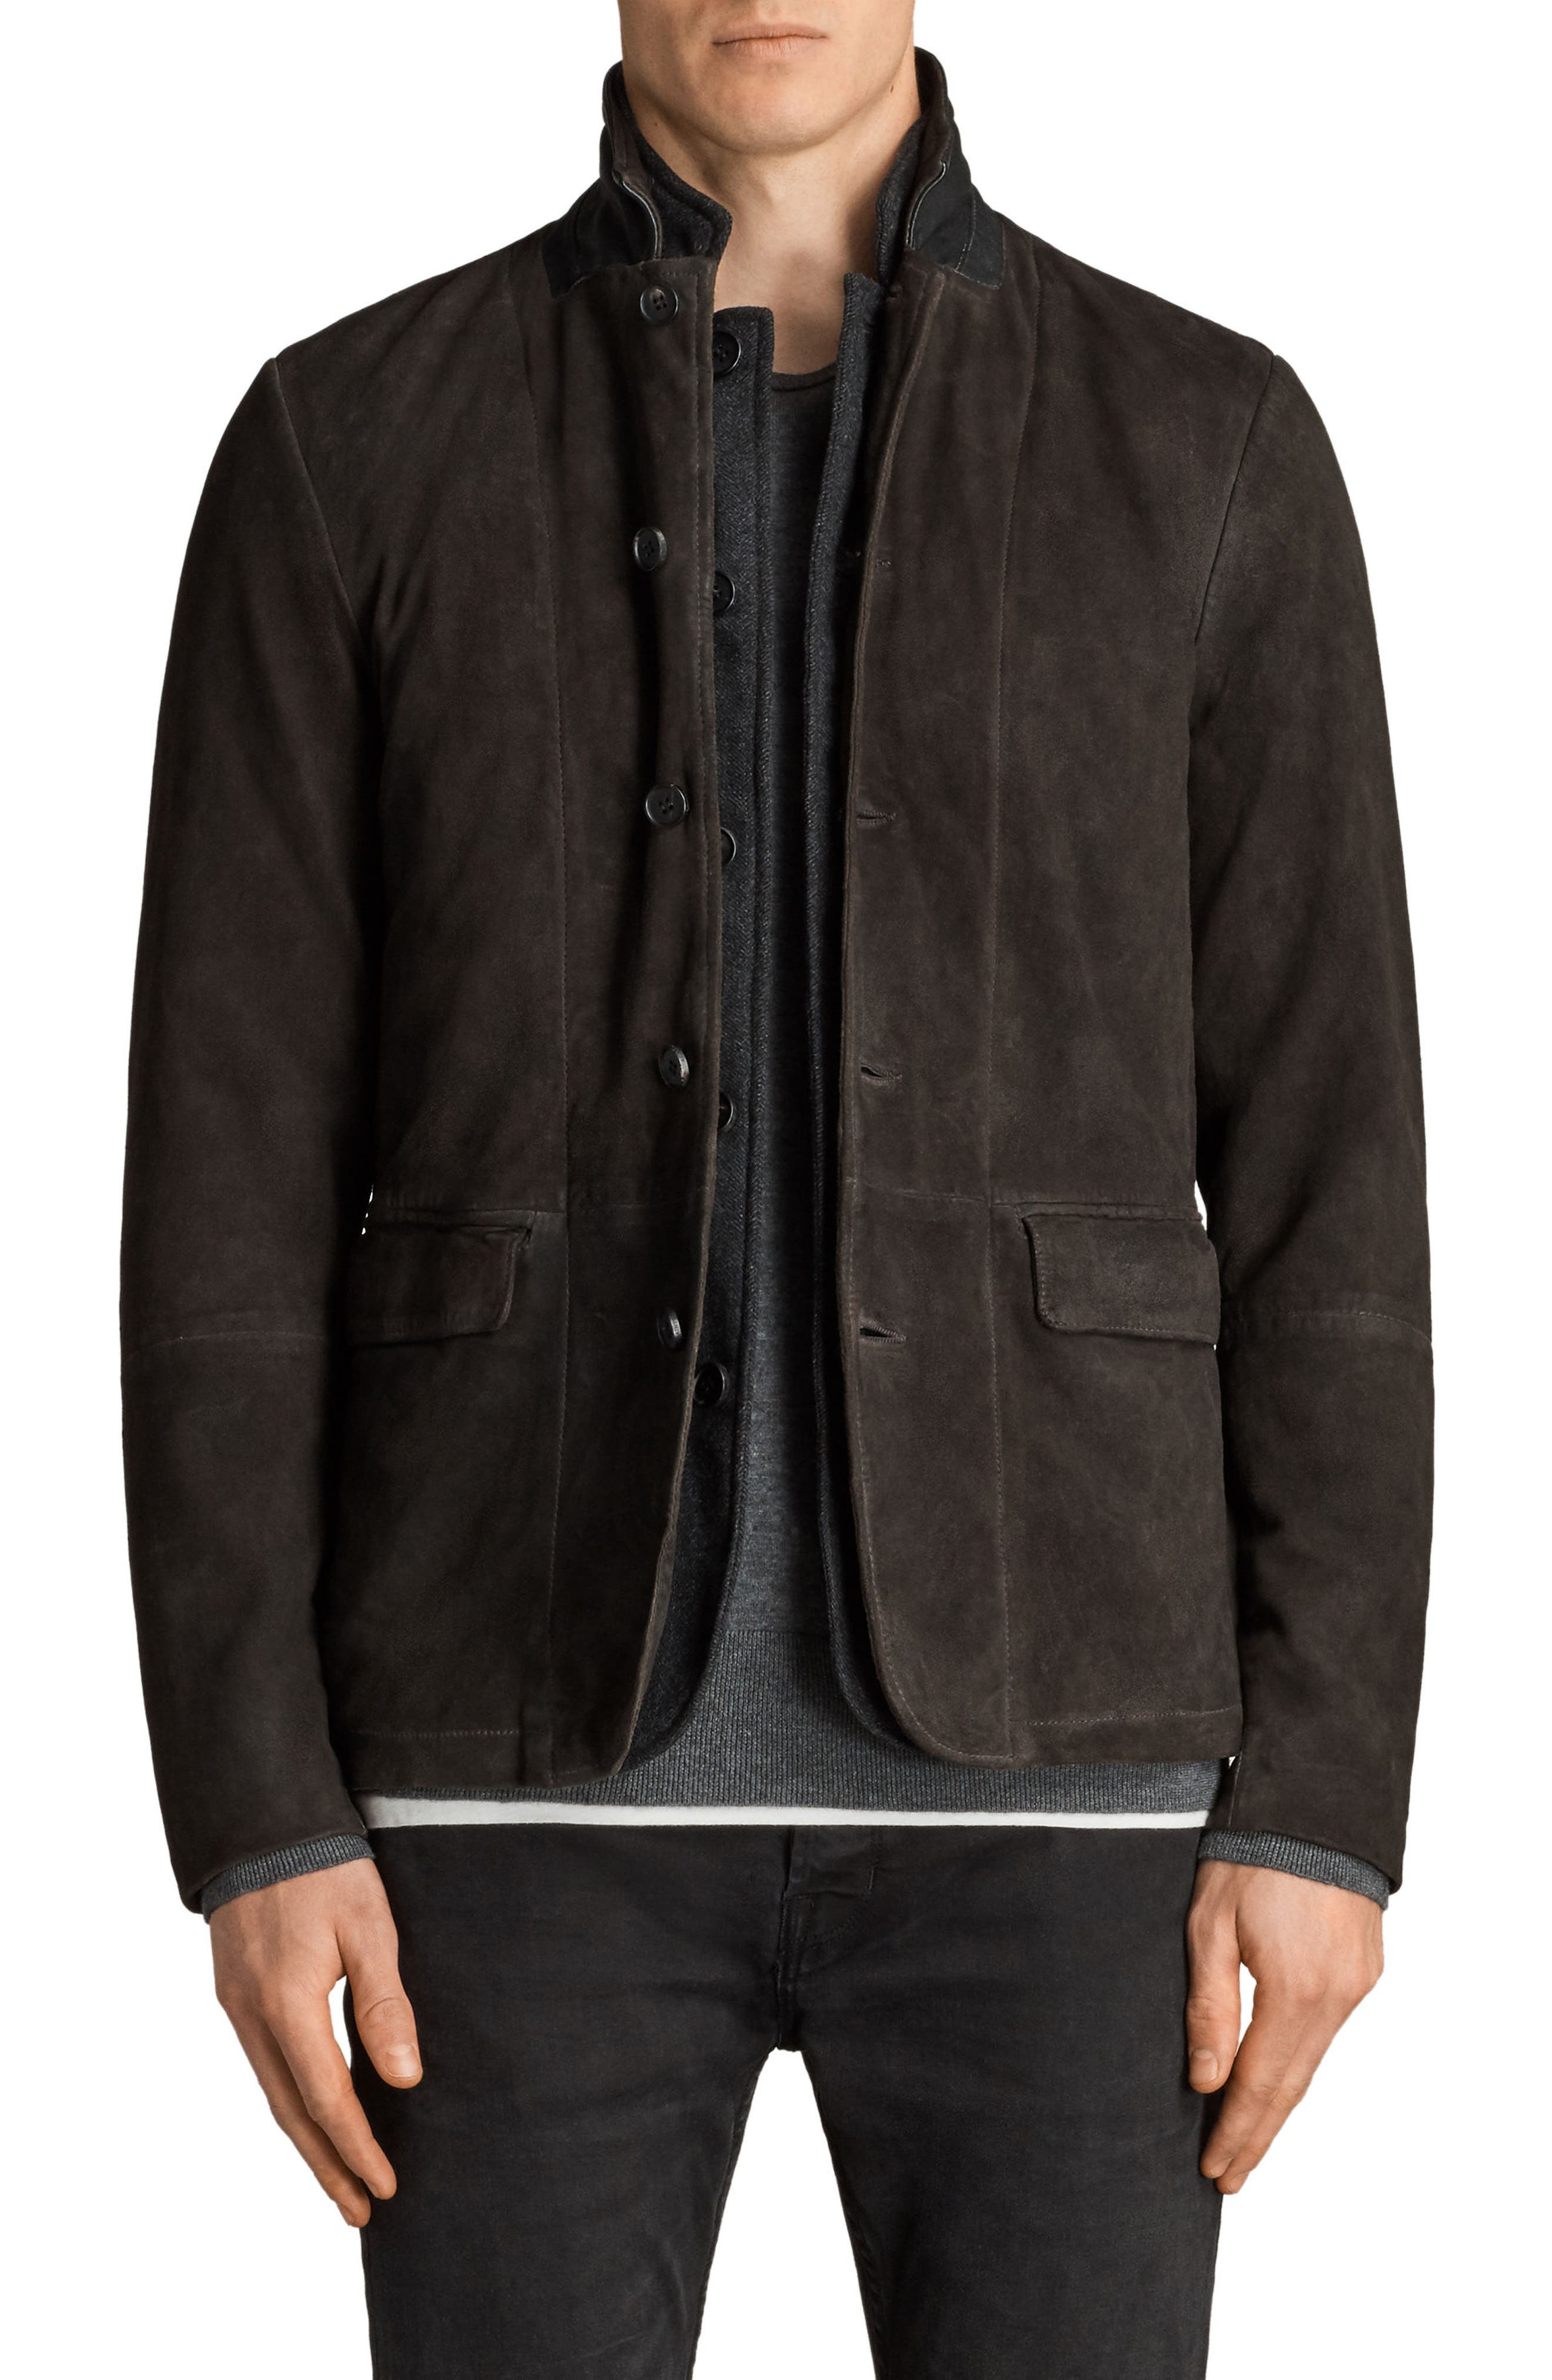 Survey Leather Blazer,                         Main,                         color, Anthracite Grey